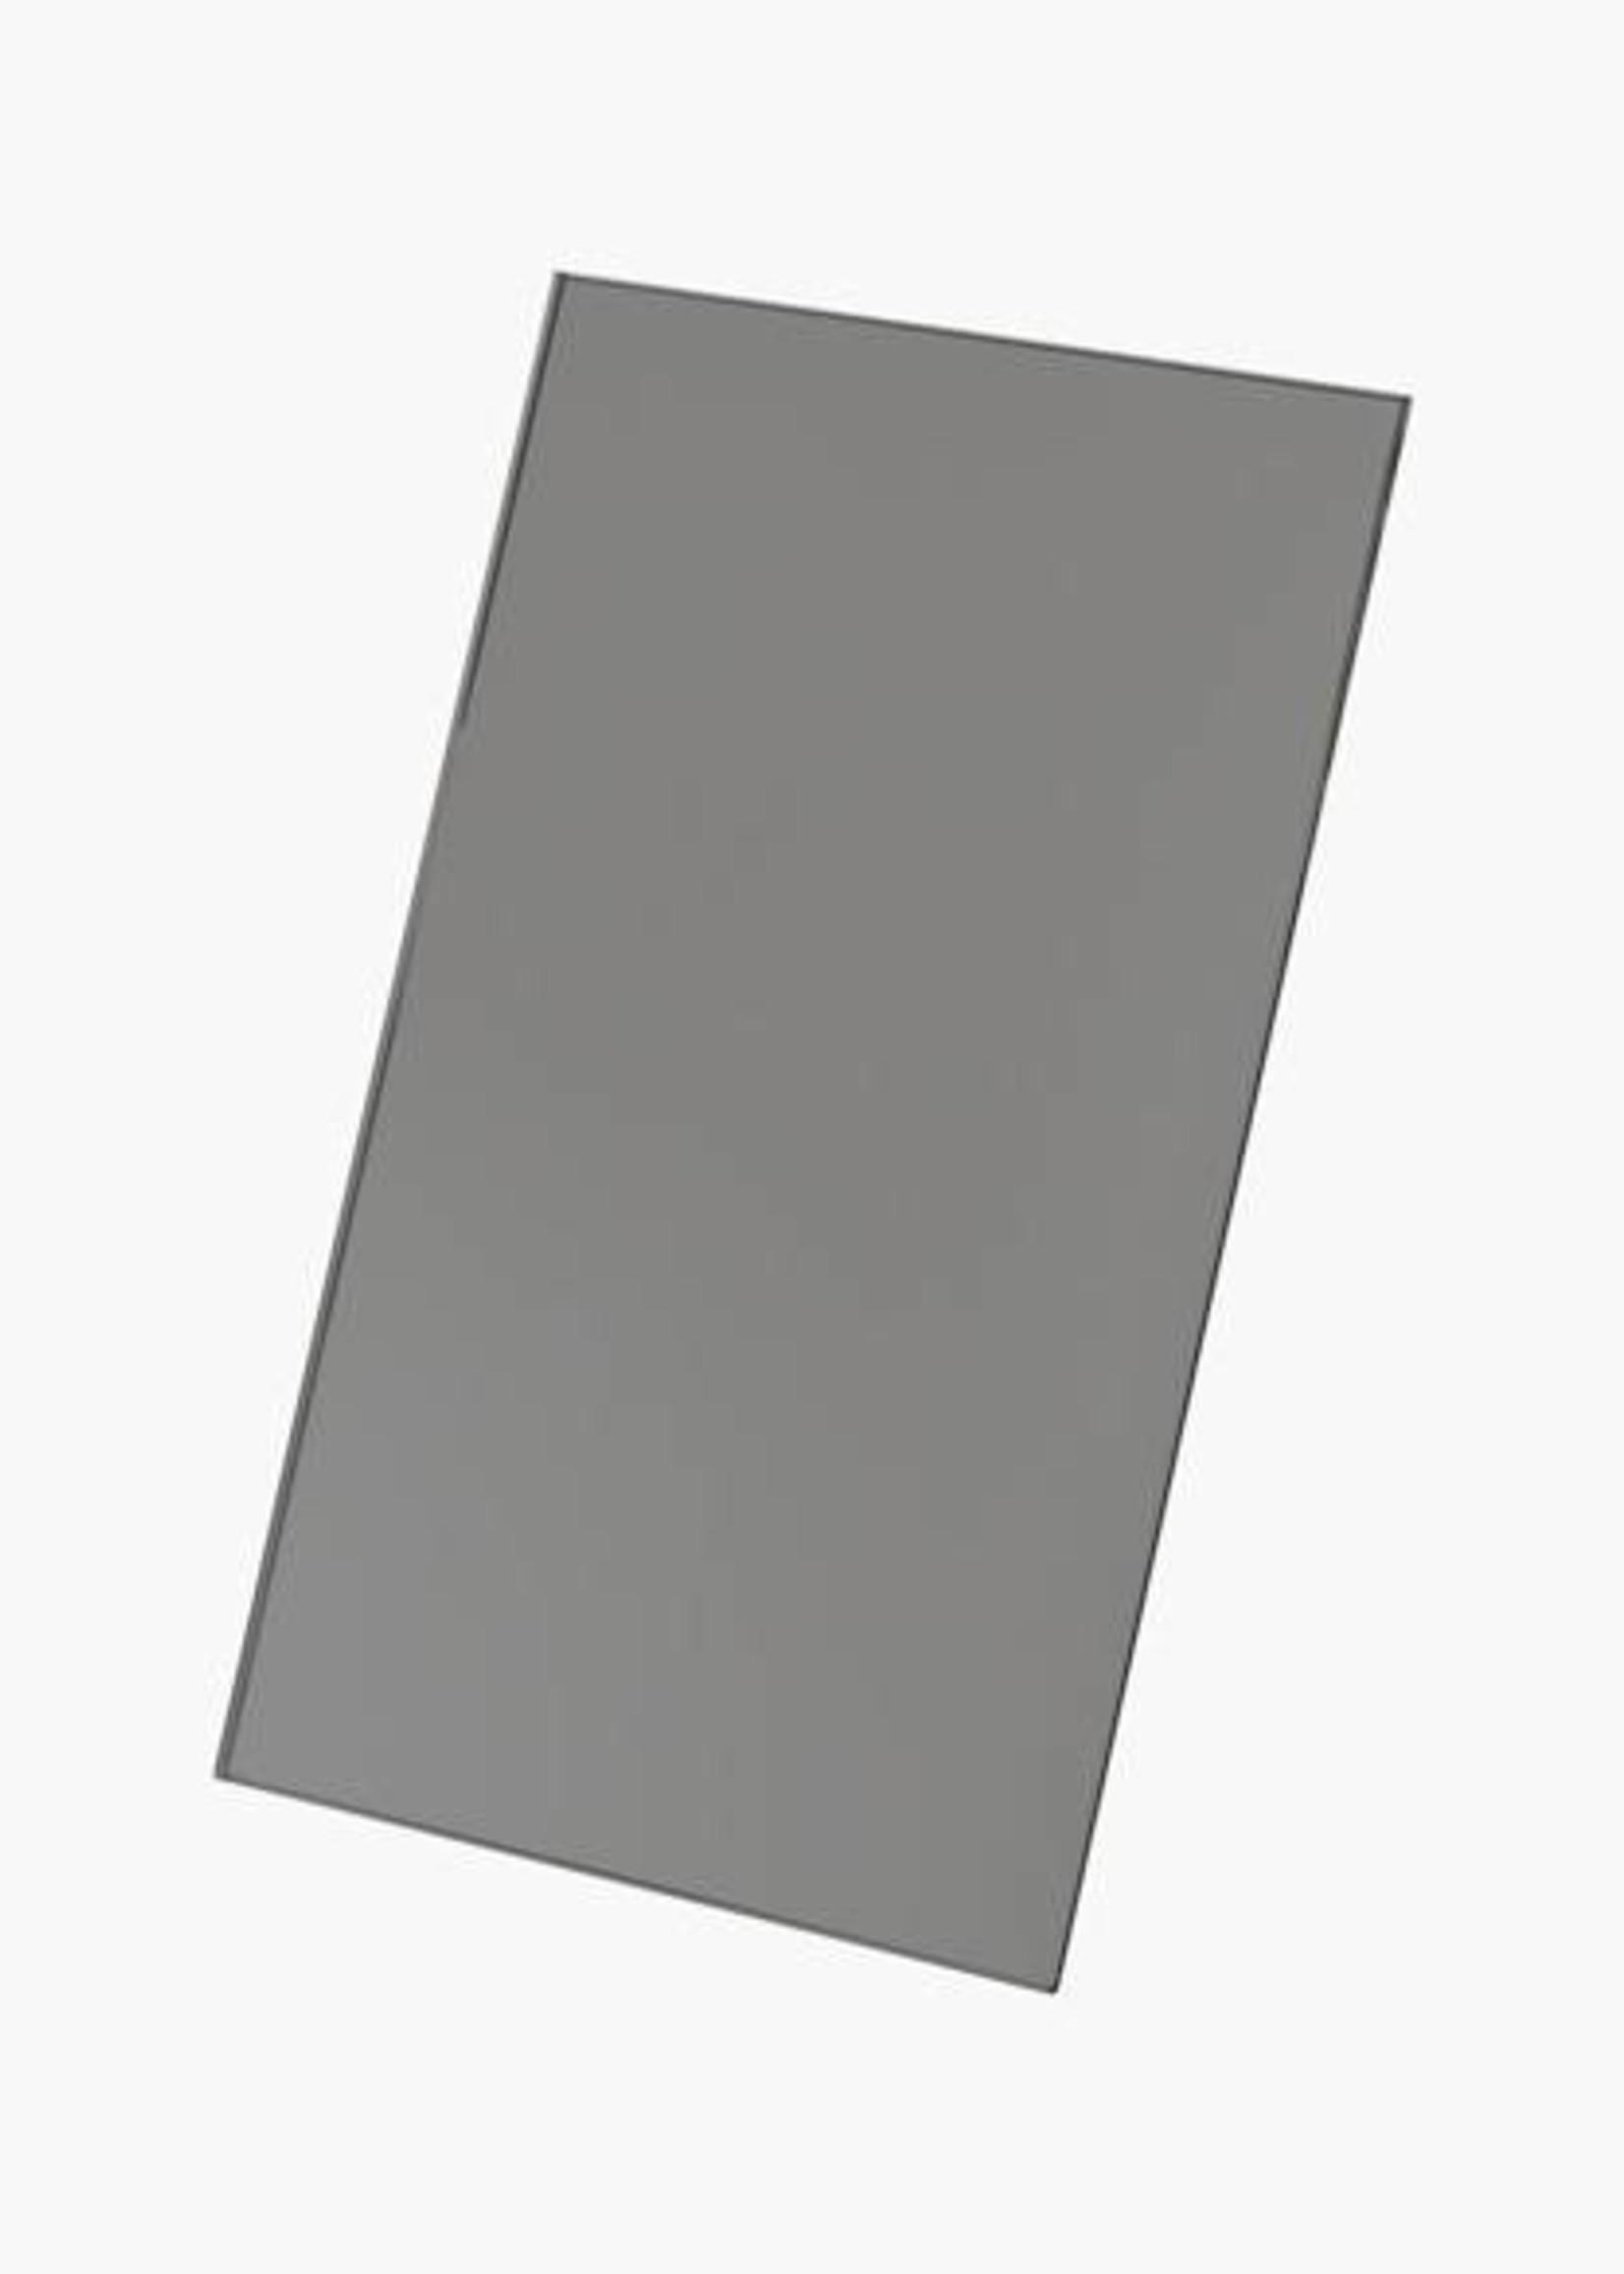 FIGR1 REFLECTOR RECTANGLE - GREY